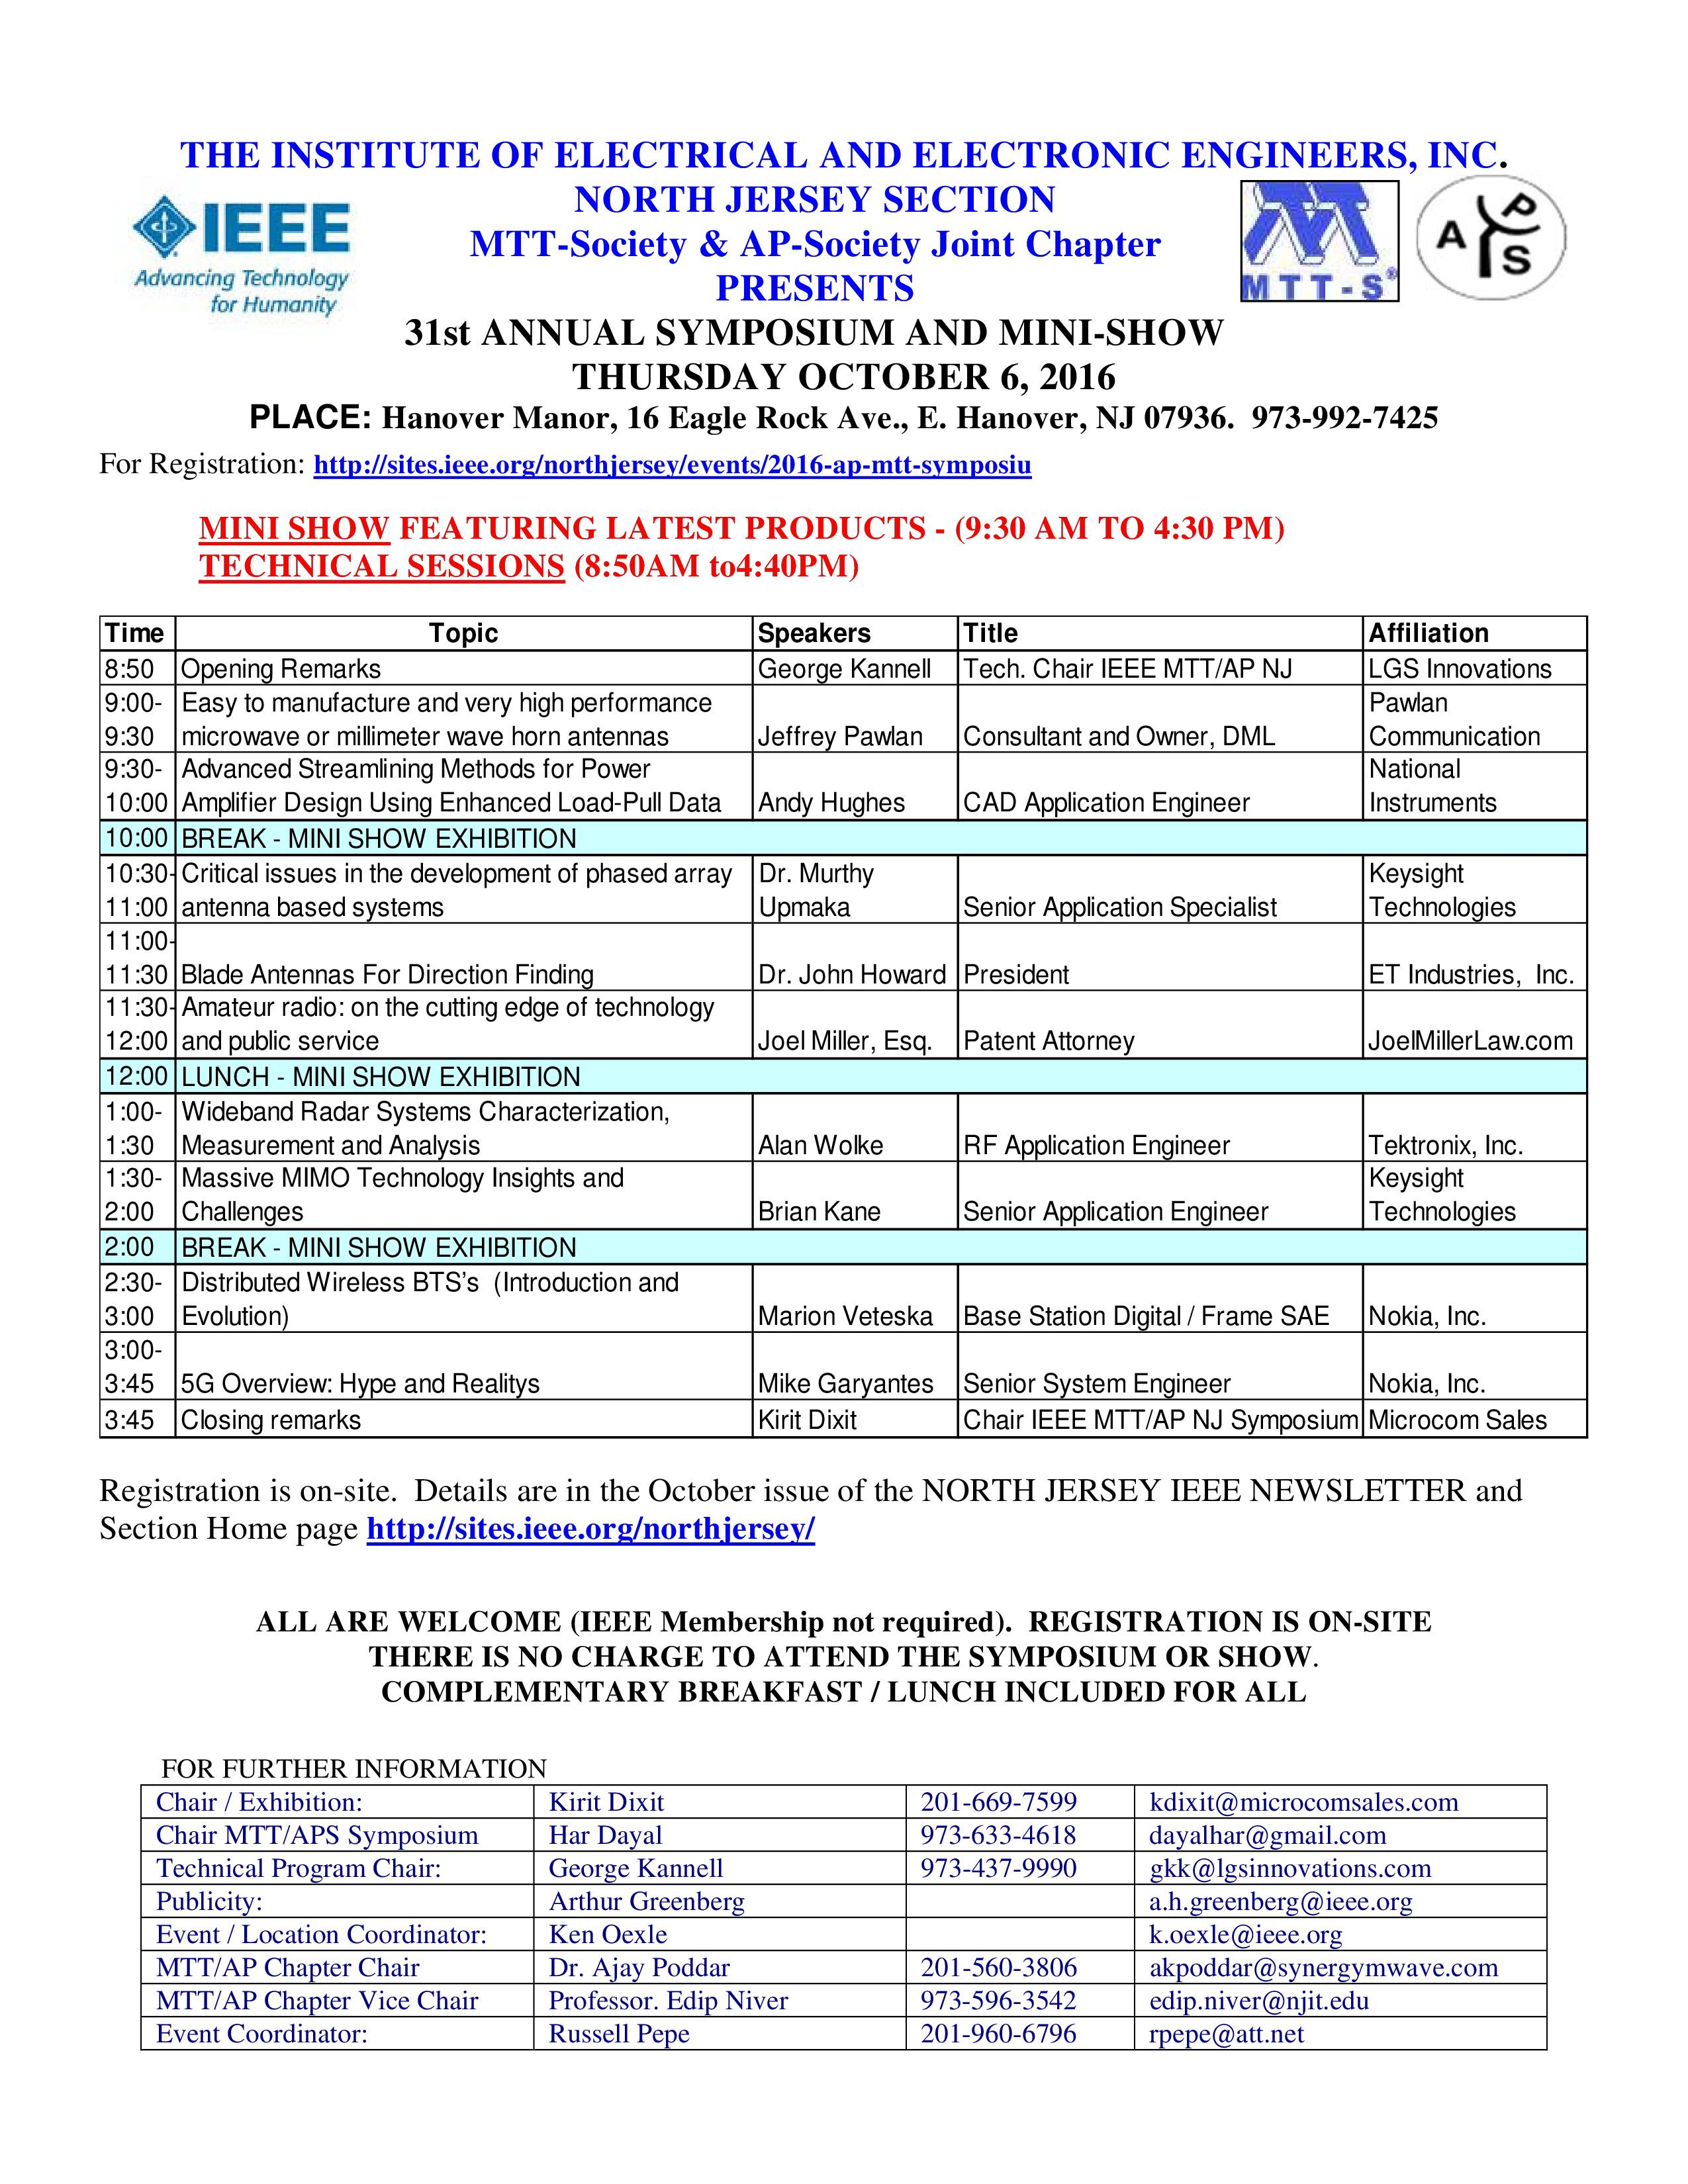 IEEE_Symposium_2016 Flyer